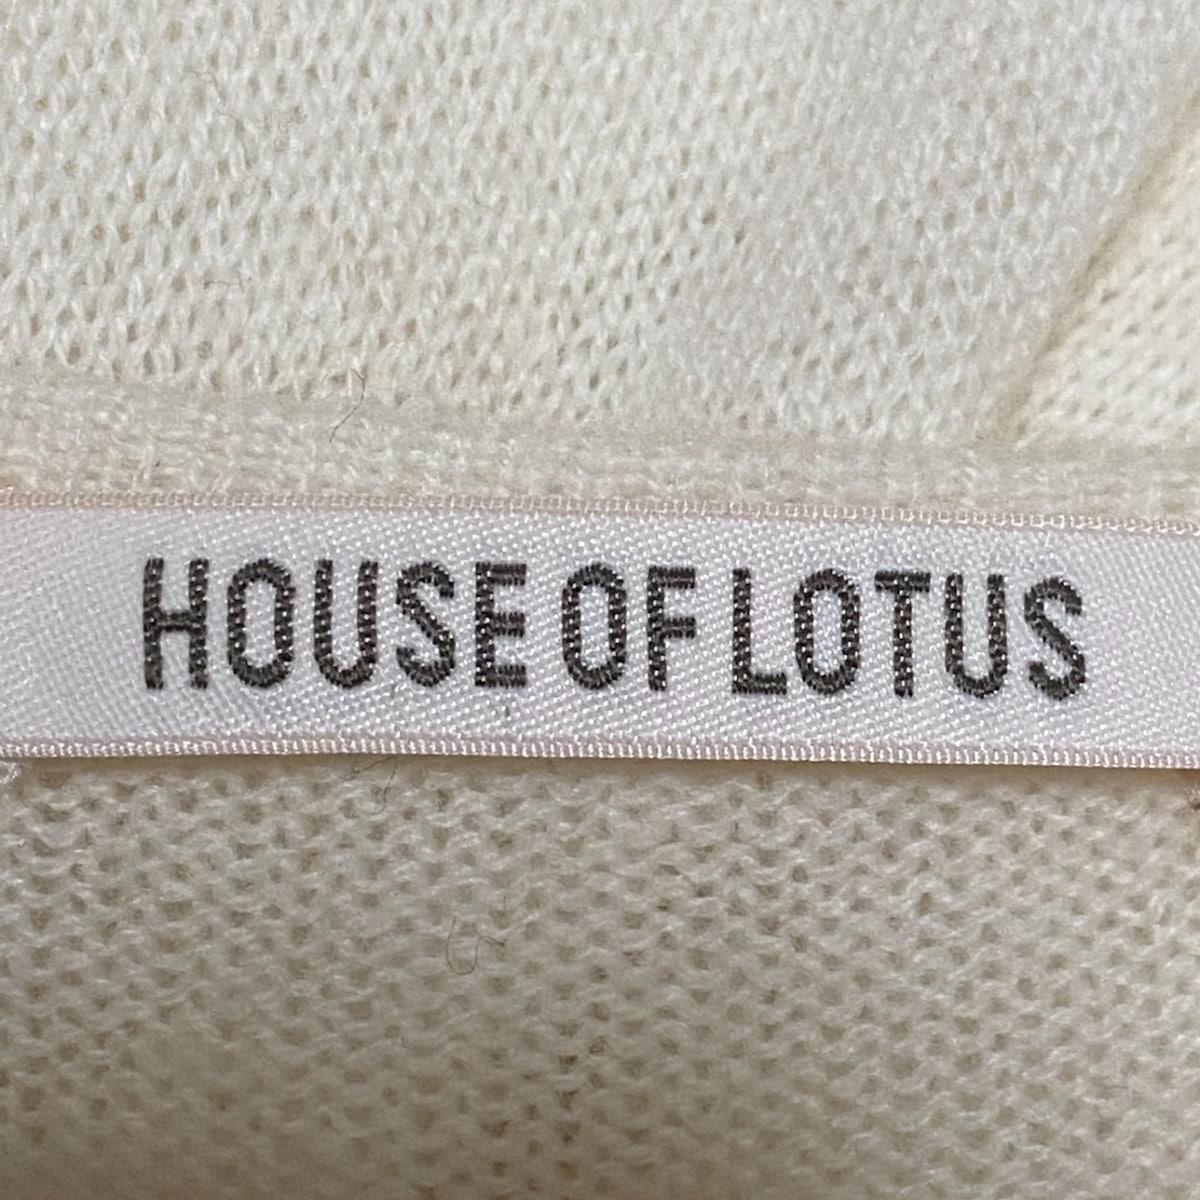 HOUSE OF LOTUS(ハウス オブ ロータス)のカーディガン